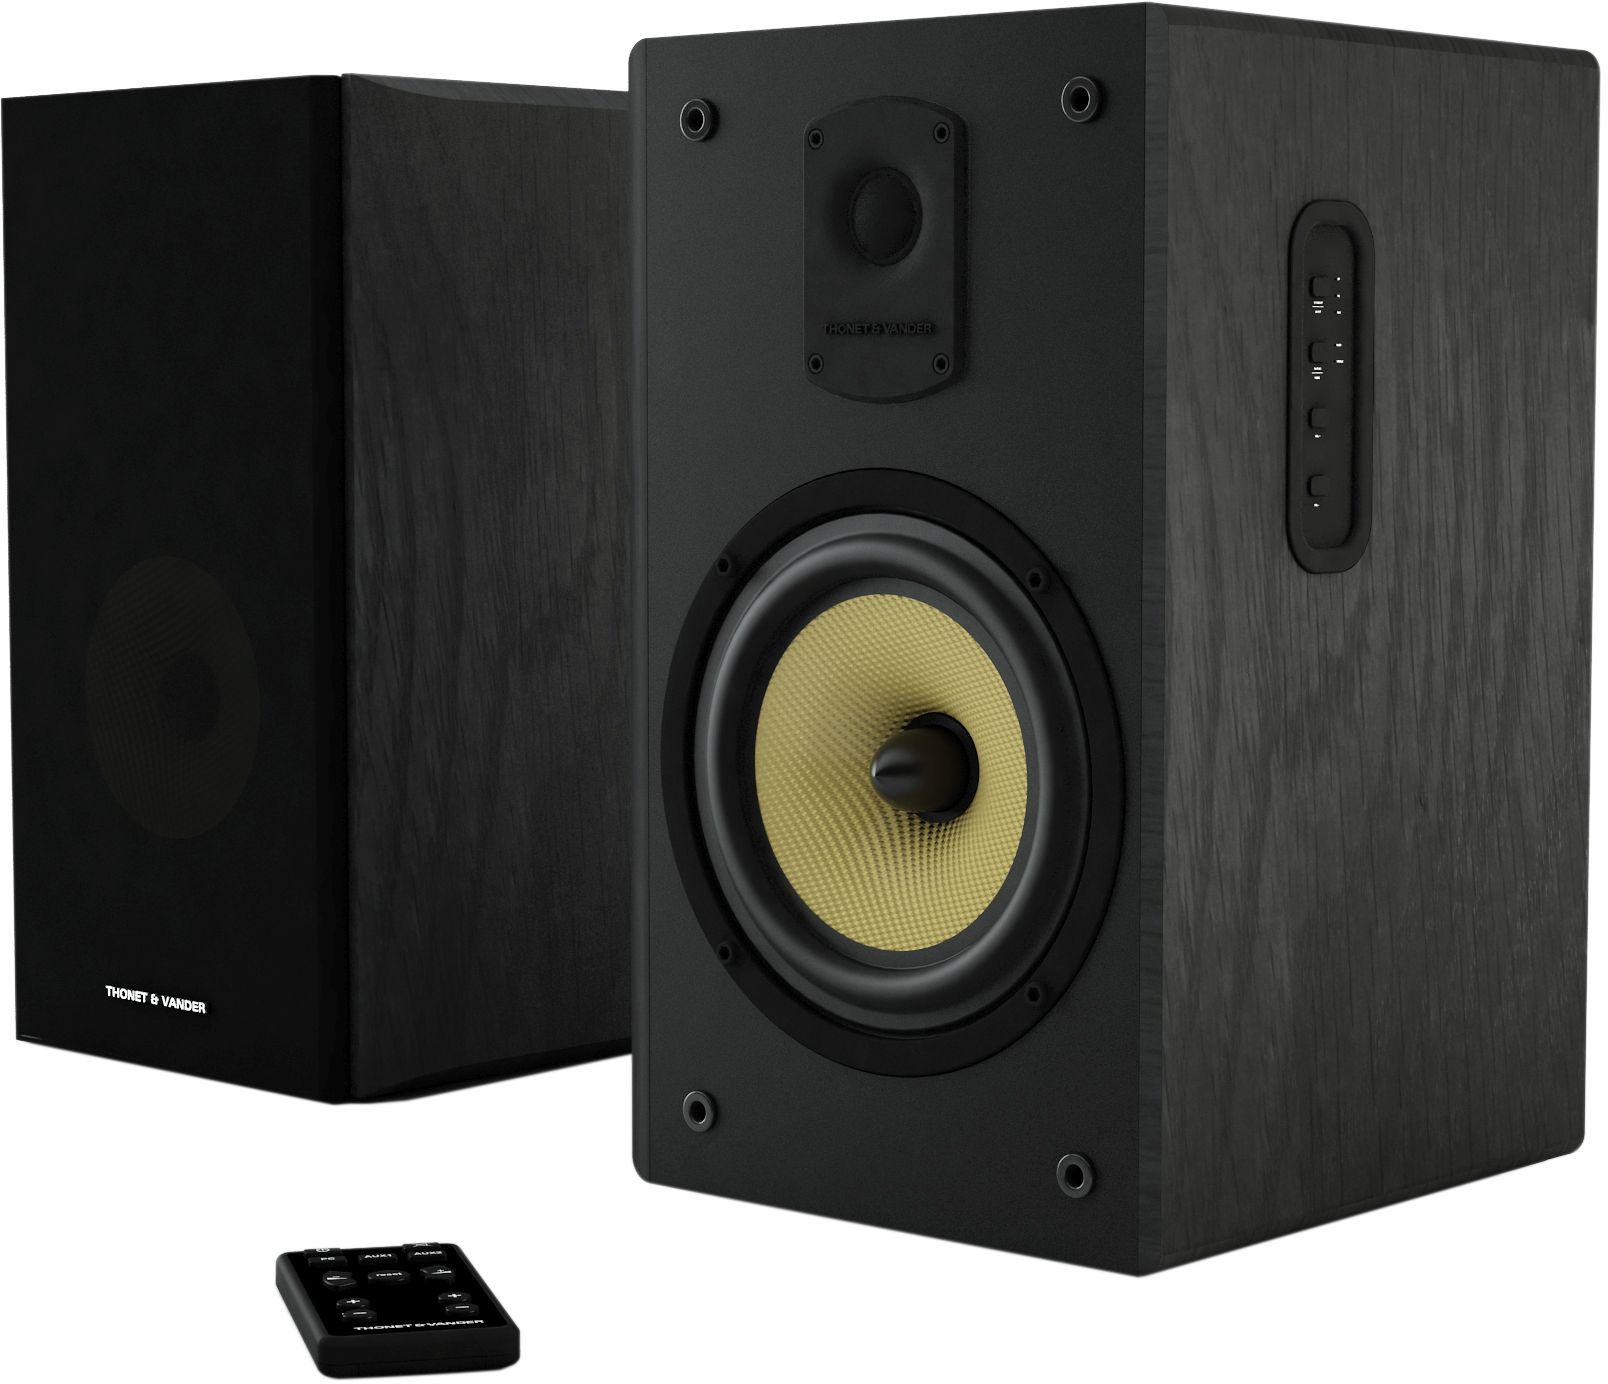 Thonet & Vander Kugel Bluetooth Speakers 280W MAX